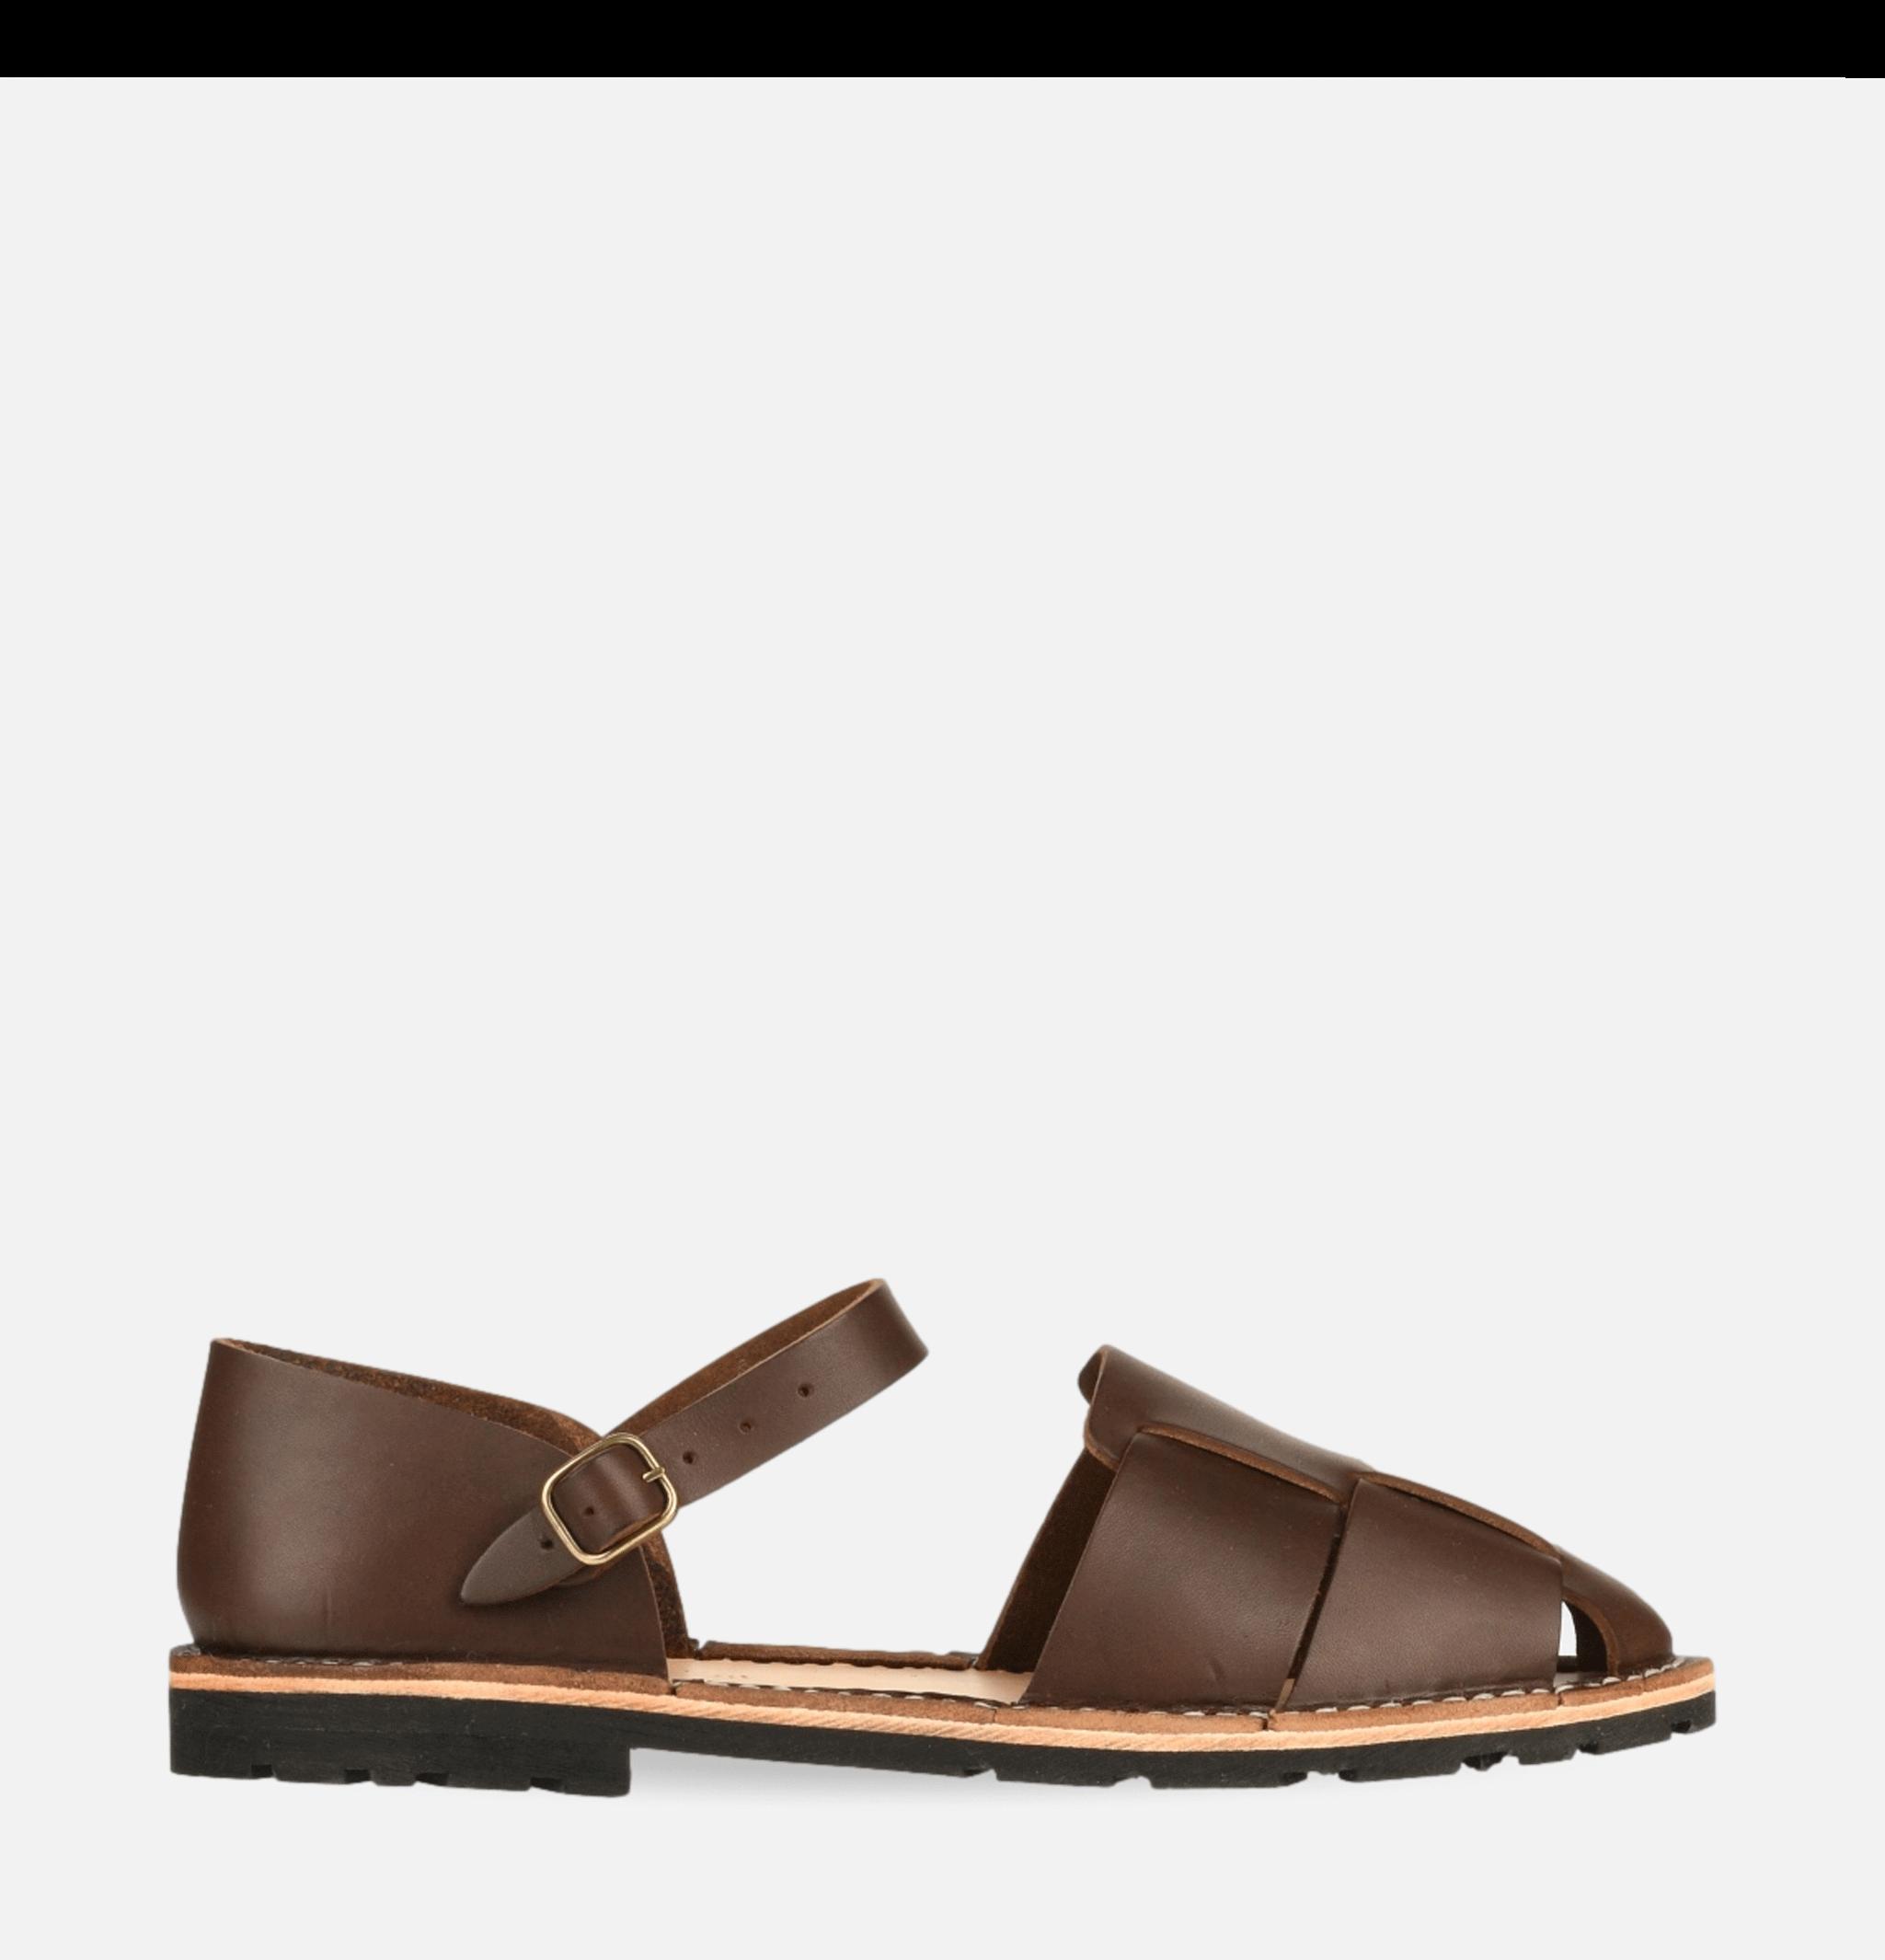 Artisanal Sandal 11 Chocolate